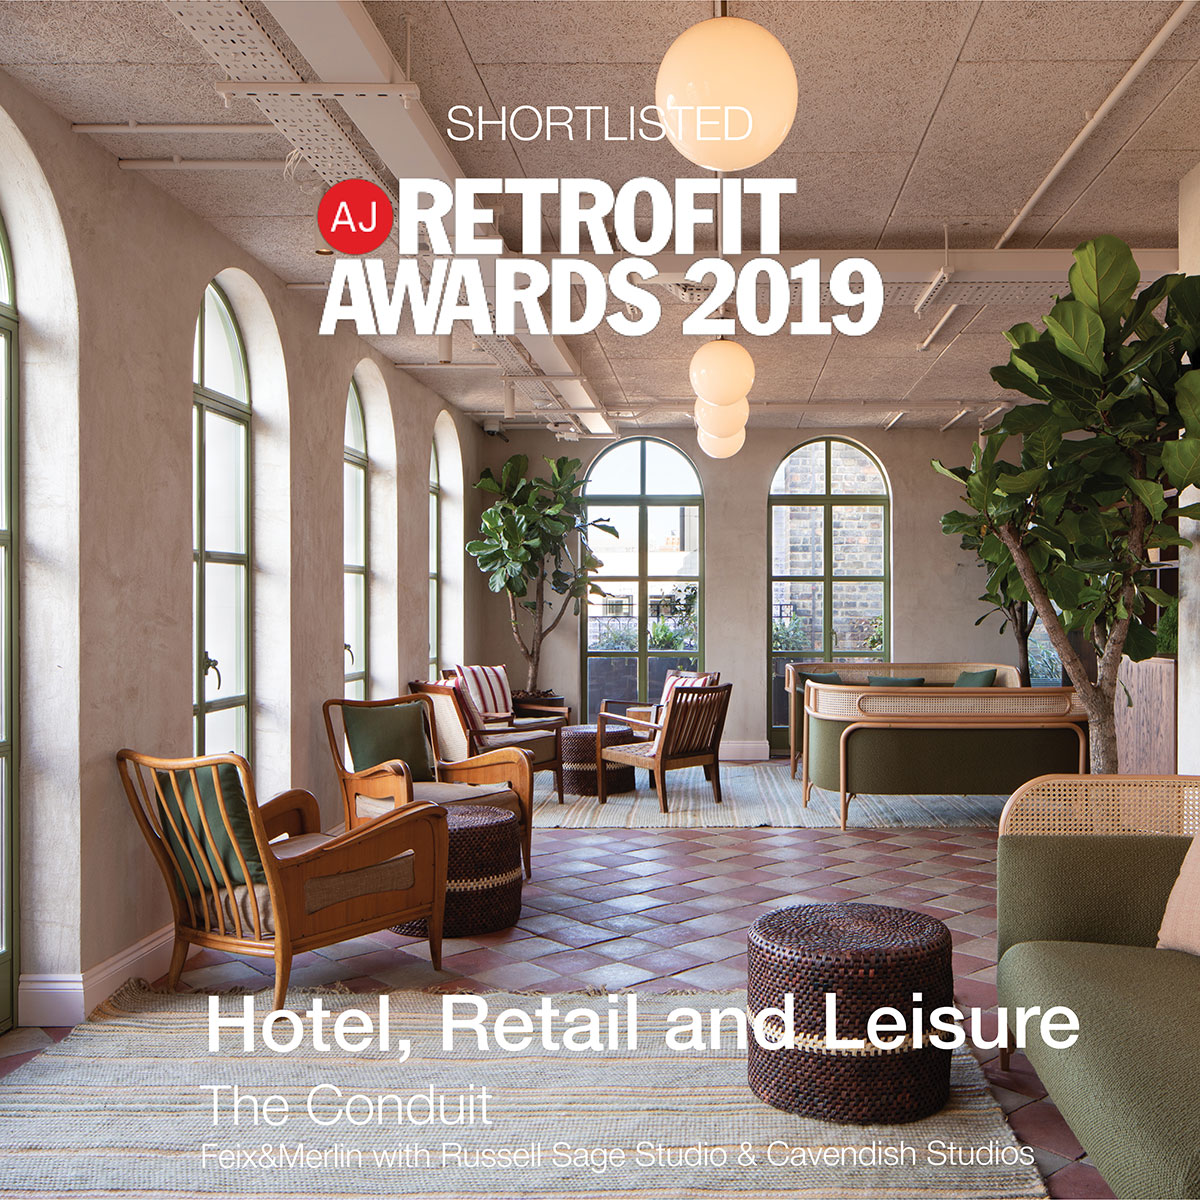 AJ Retrofit Awards